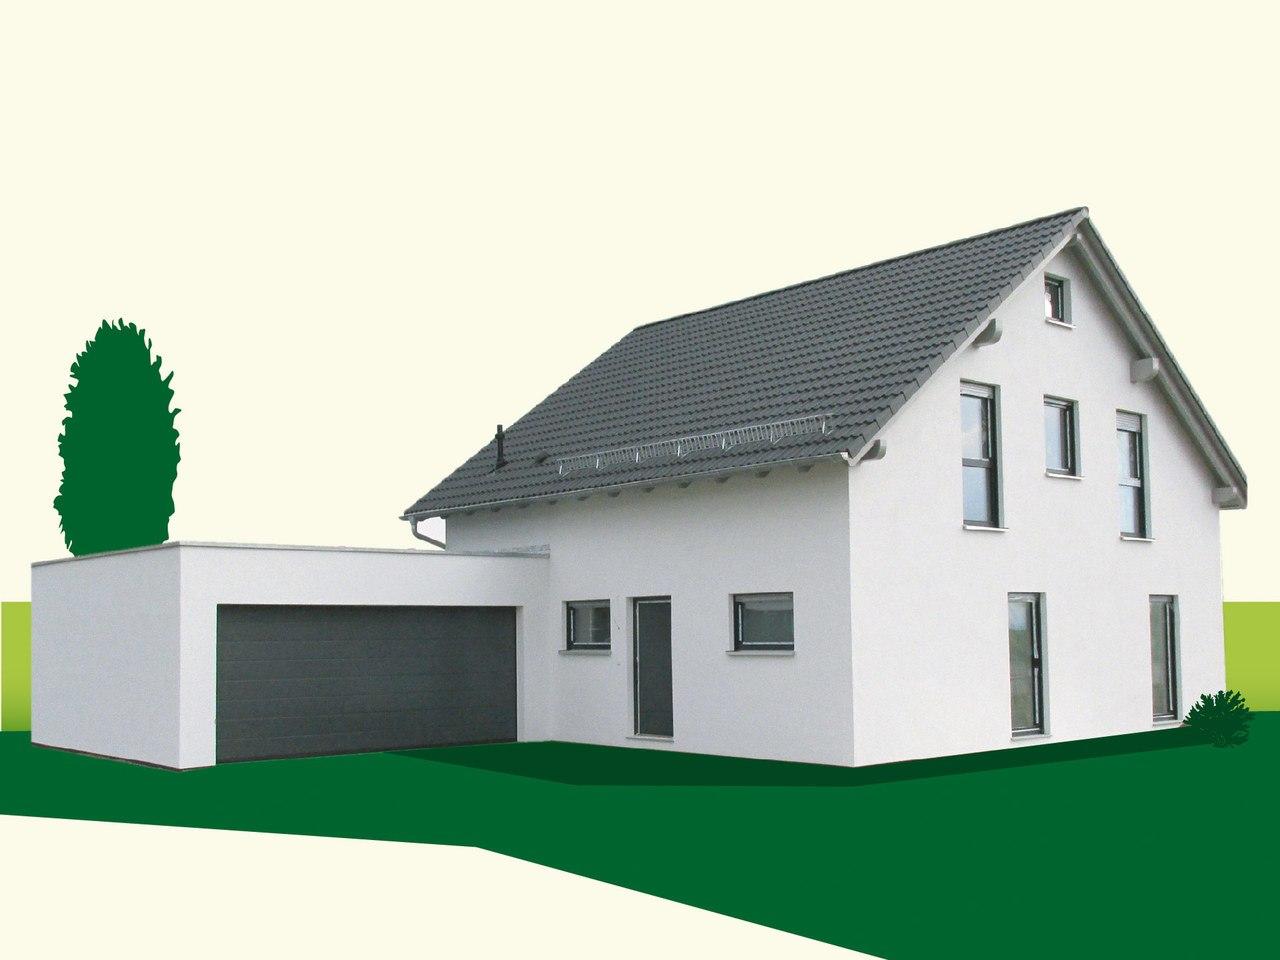 Einfamilienhaus SD132 - Sachsenheimer Fertighaus